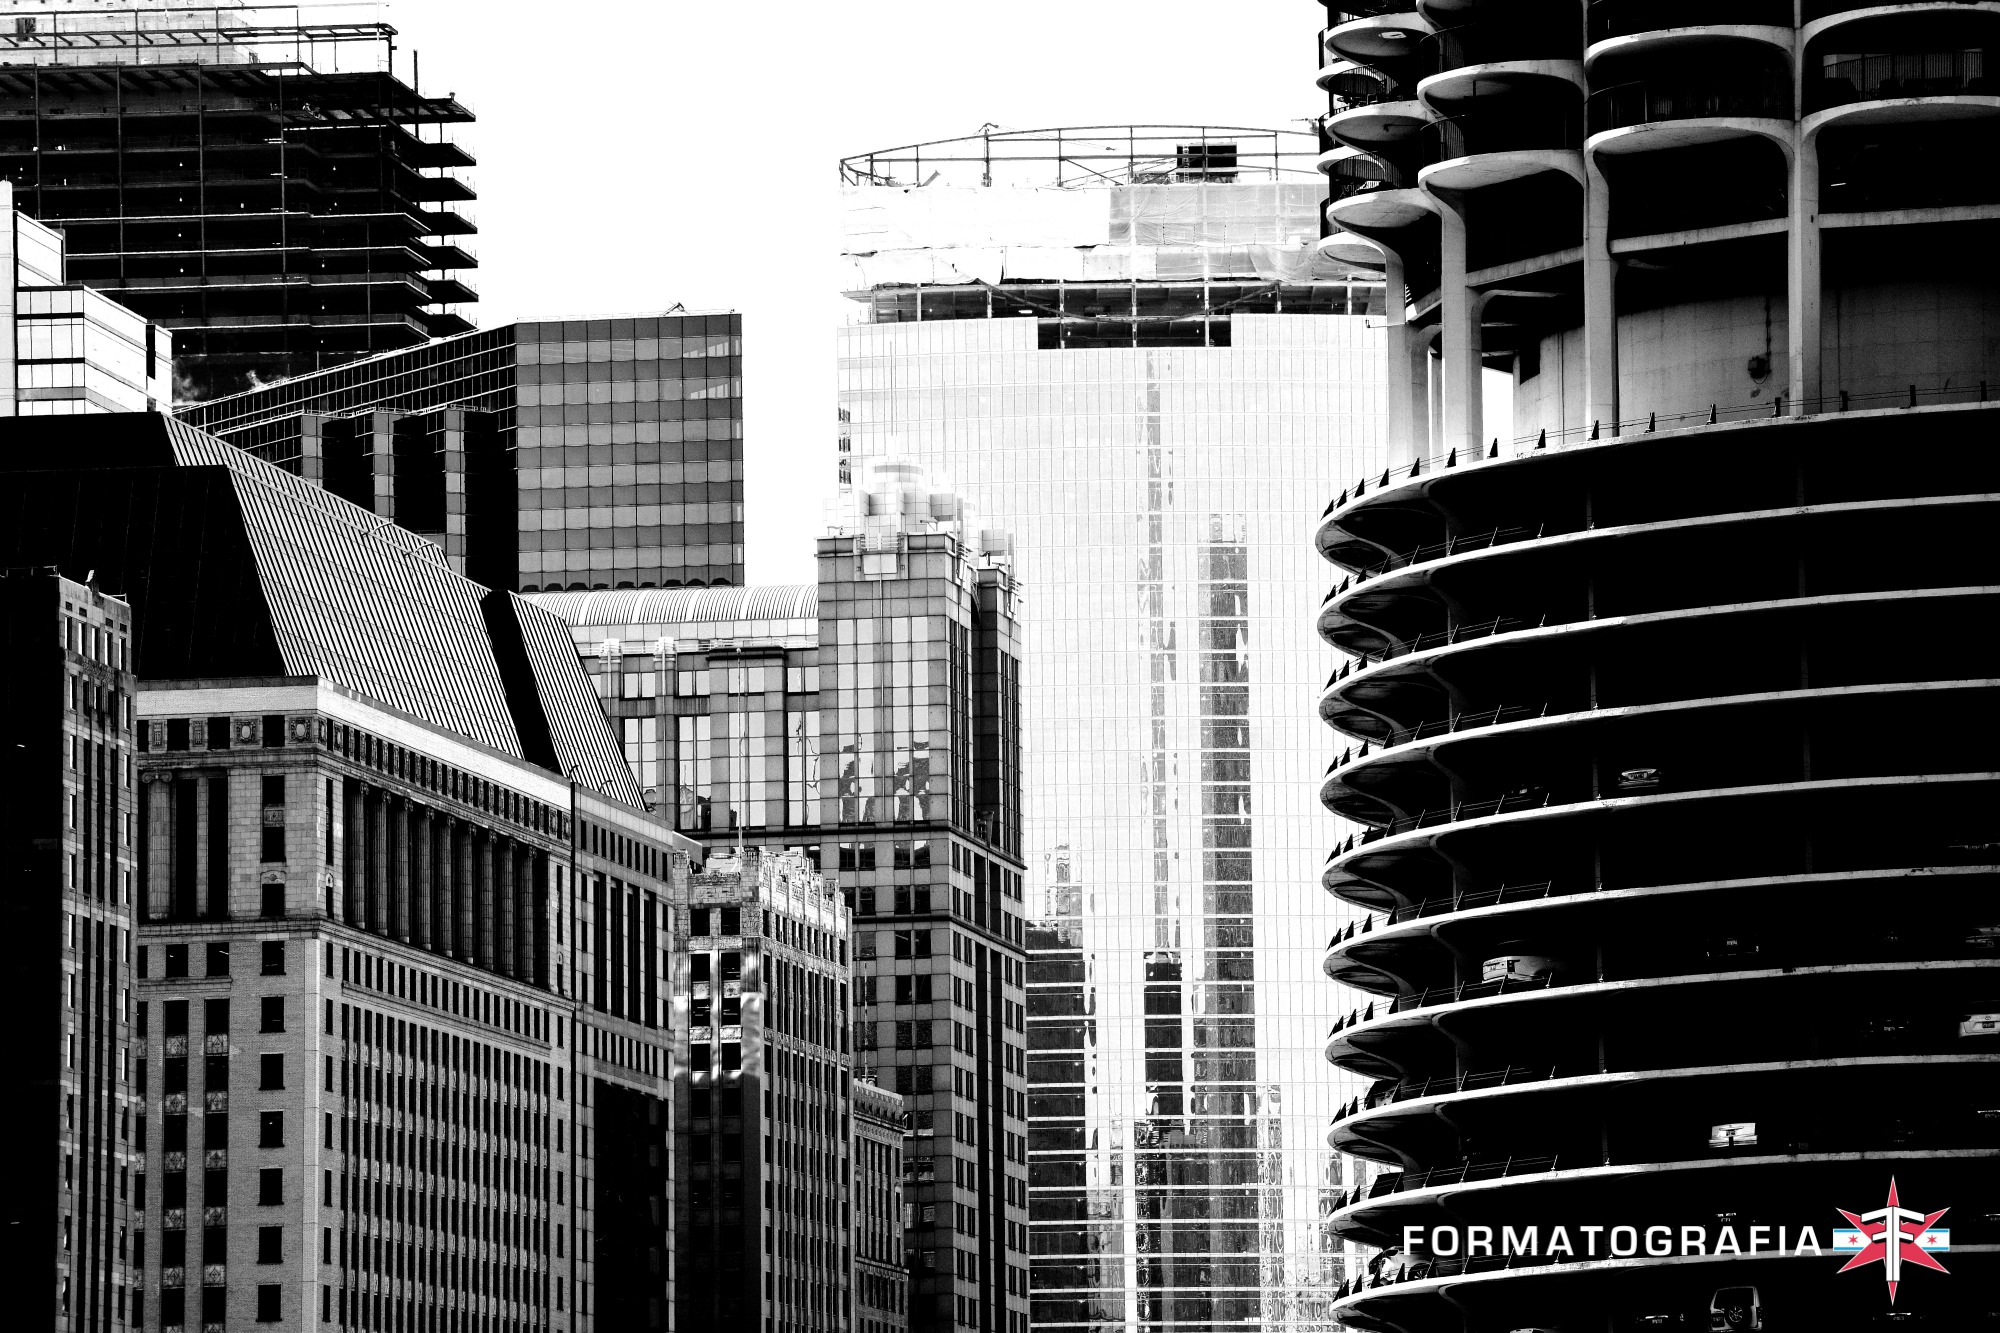 eric formato chicago photographer fall update city architecture shotsDSC_0608_tonemapped.jpg